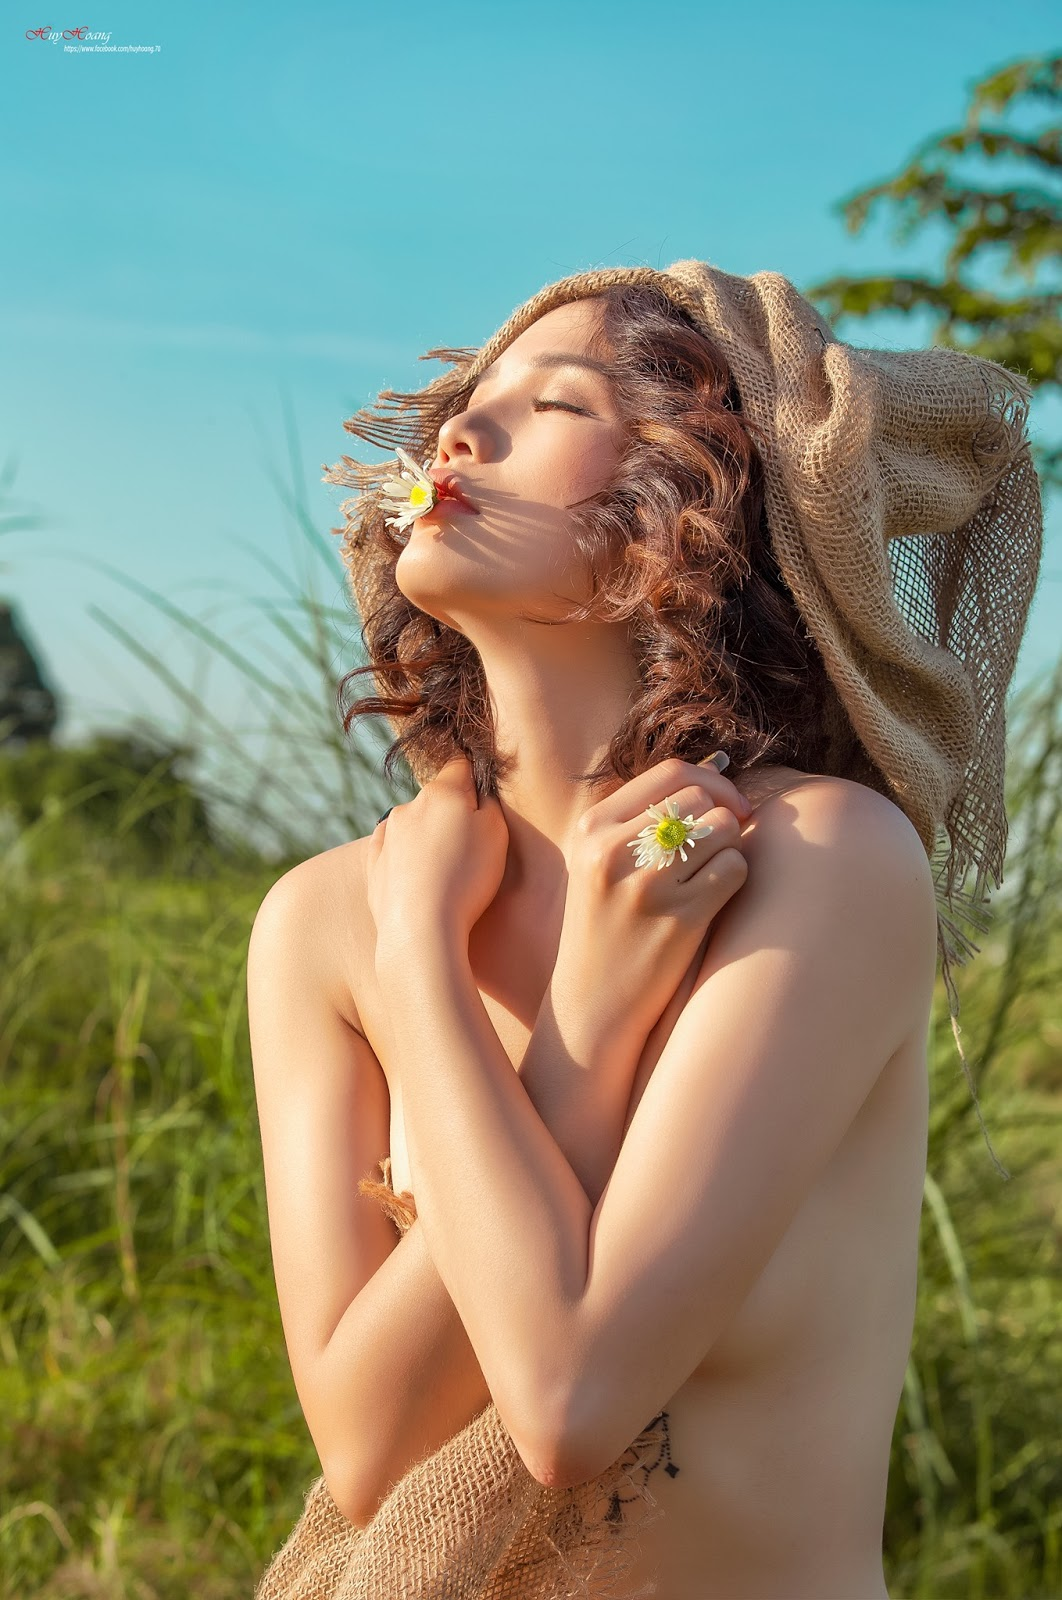 Cỏ và em @BaoBua: Việt Nam Nude Girl